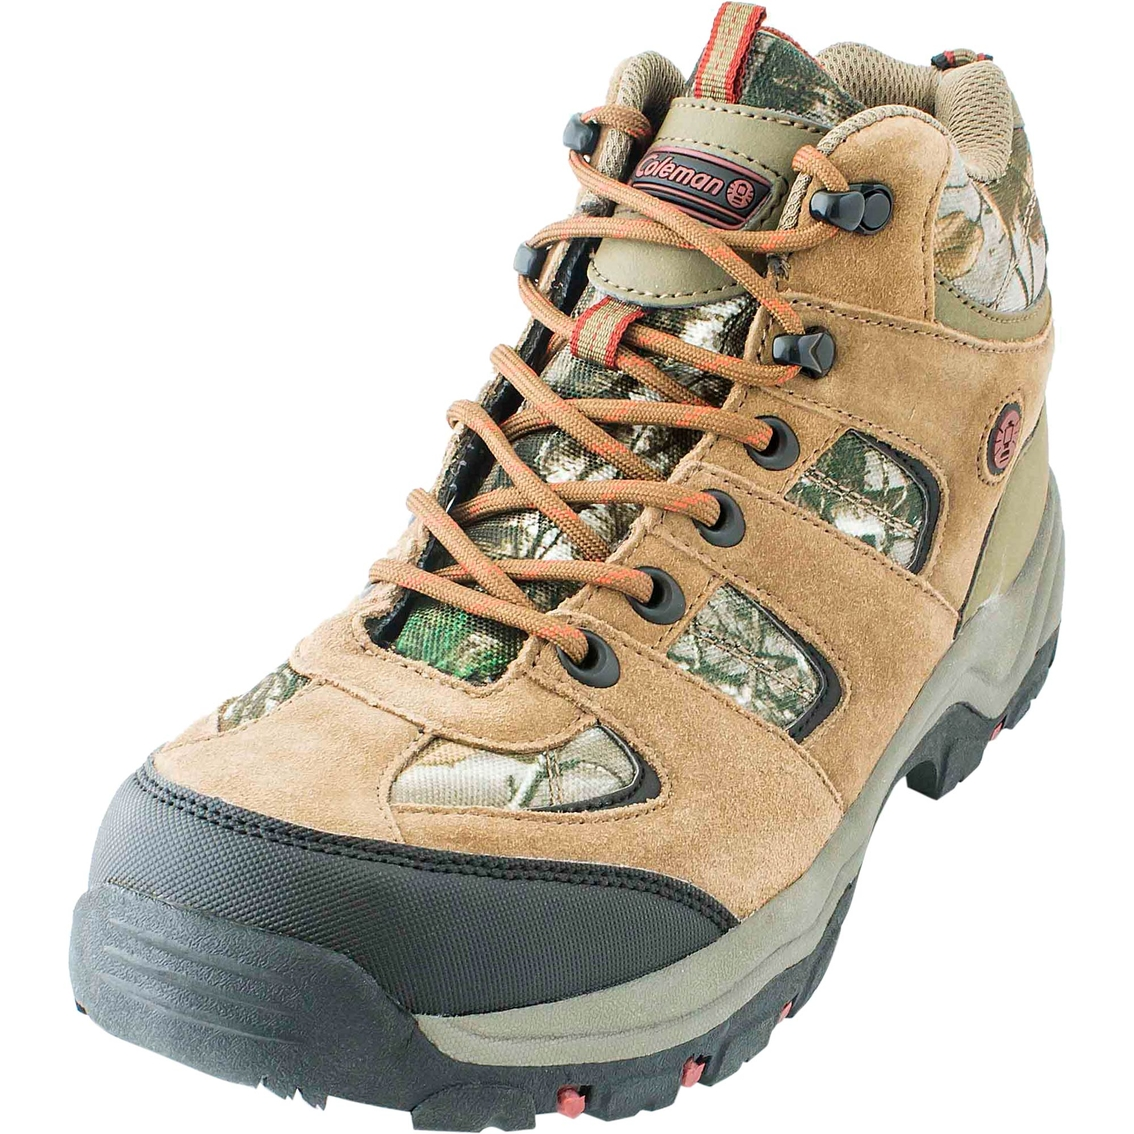 Coleman Men's Griz Hiker Shoes | Hiking